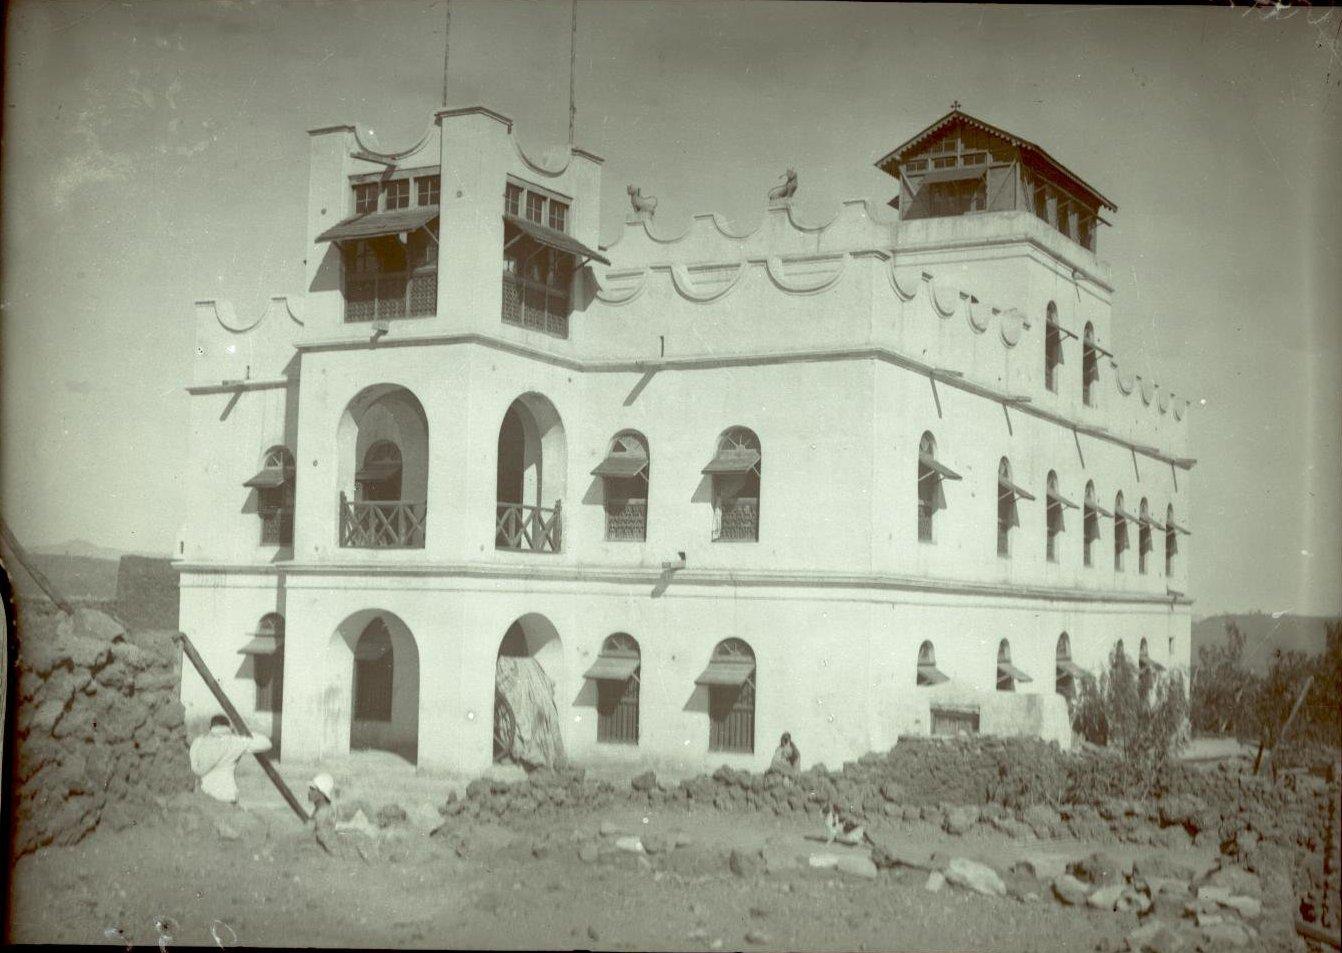 235. Абиссиния, провинция Харар, г. Харар. Новый дворец раса (правителя) Маконена